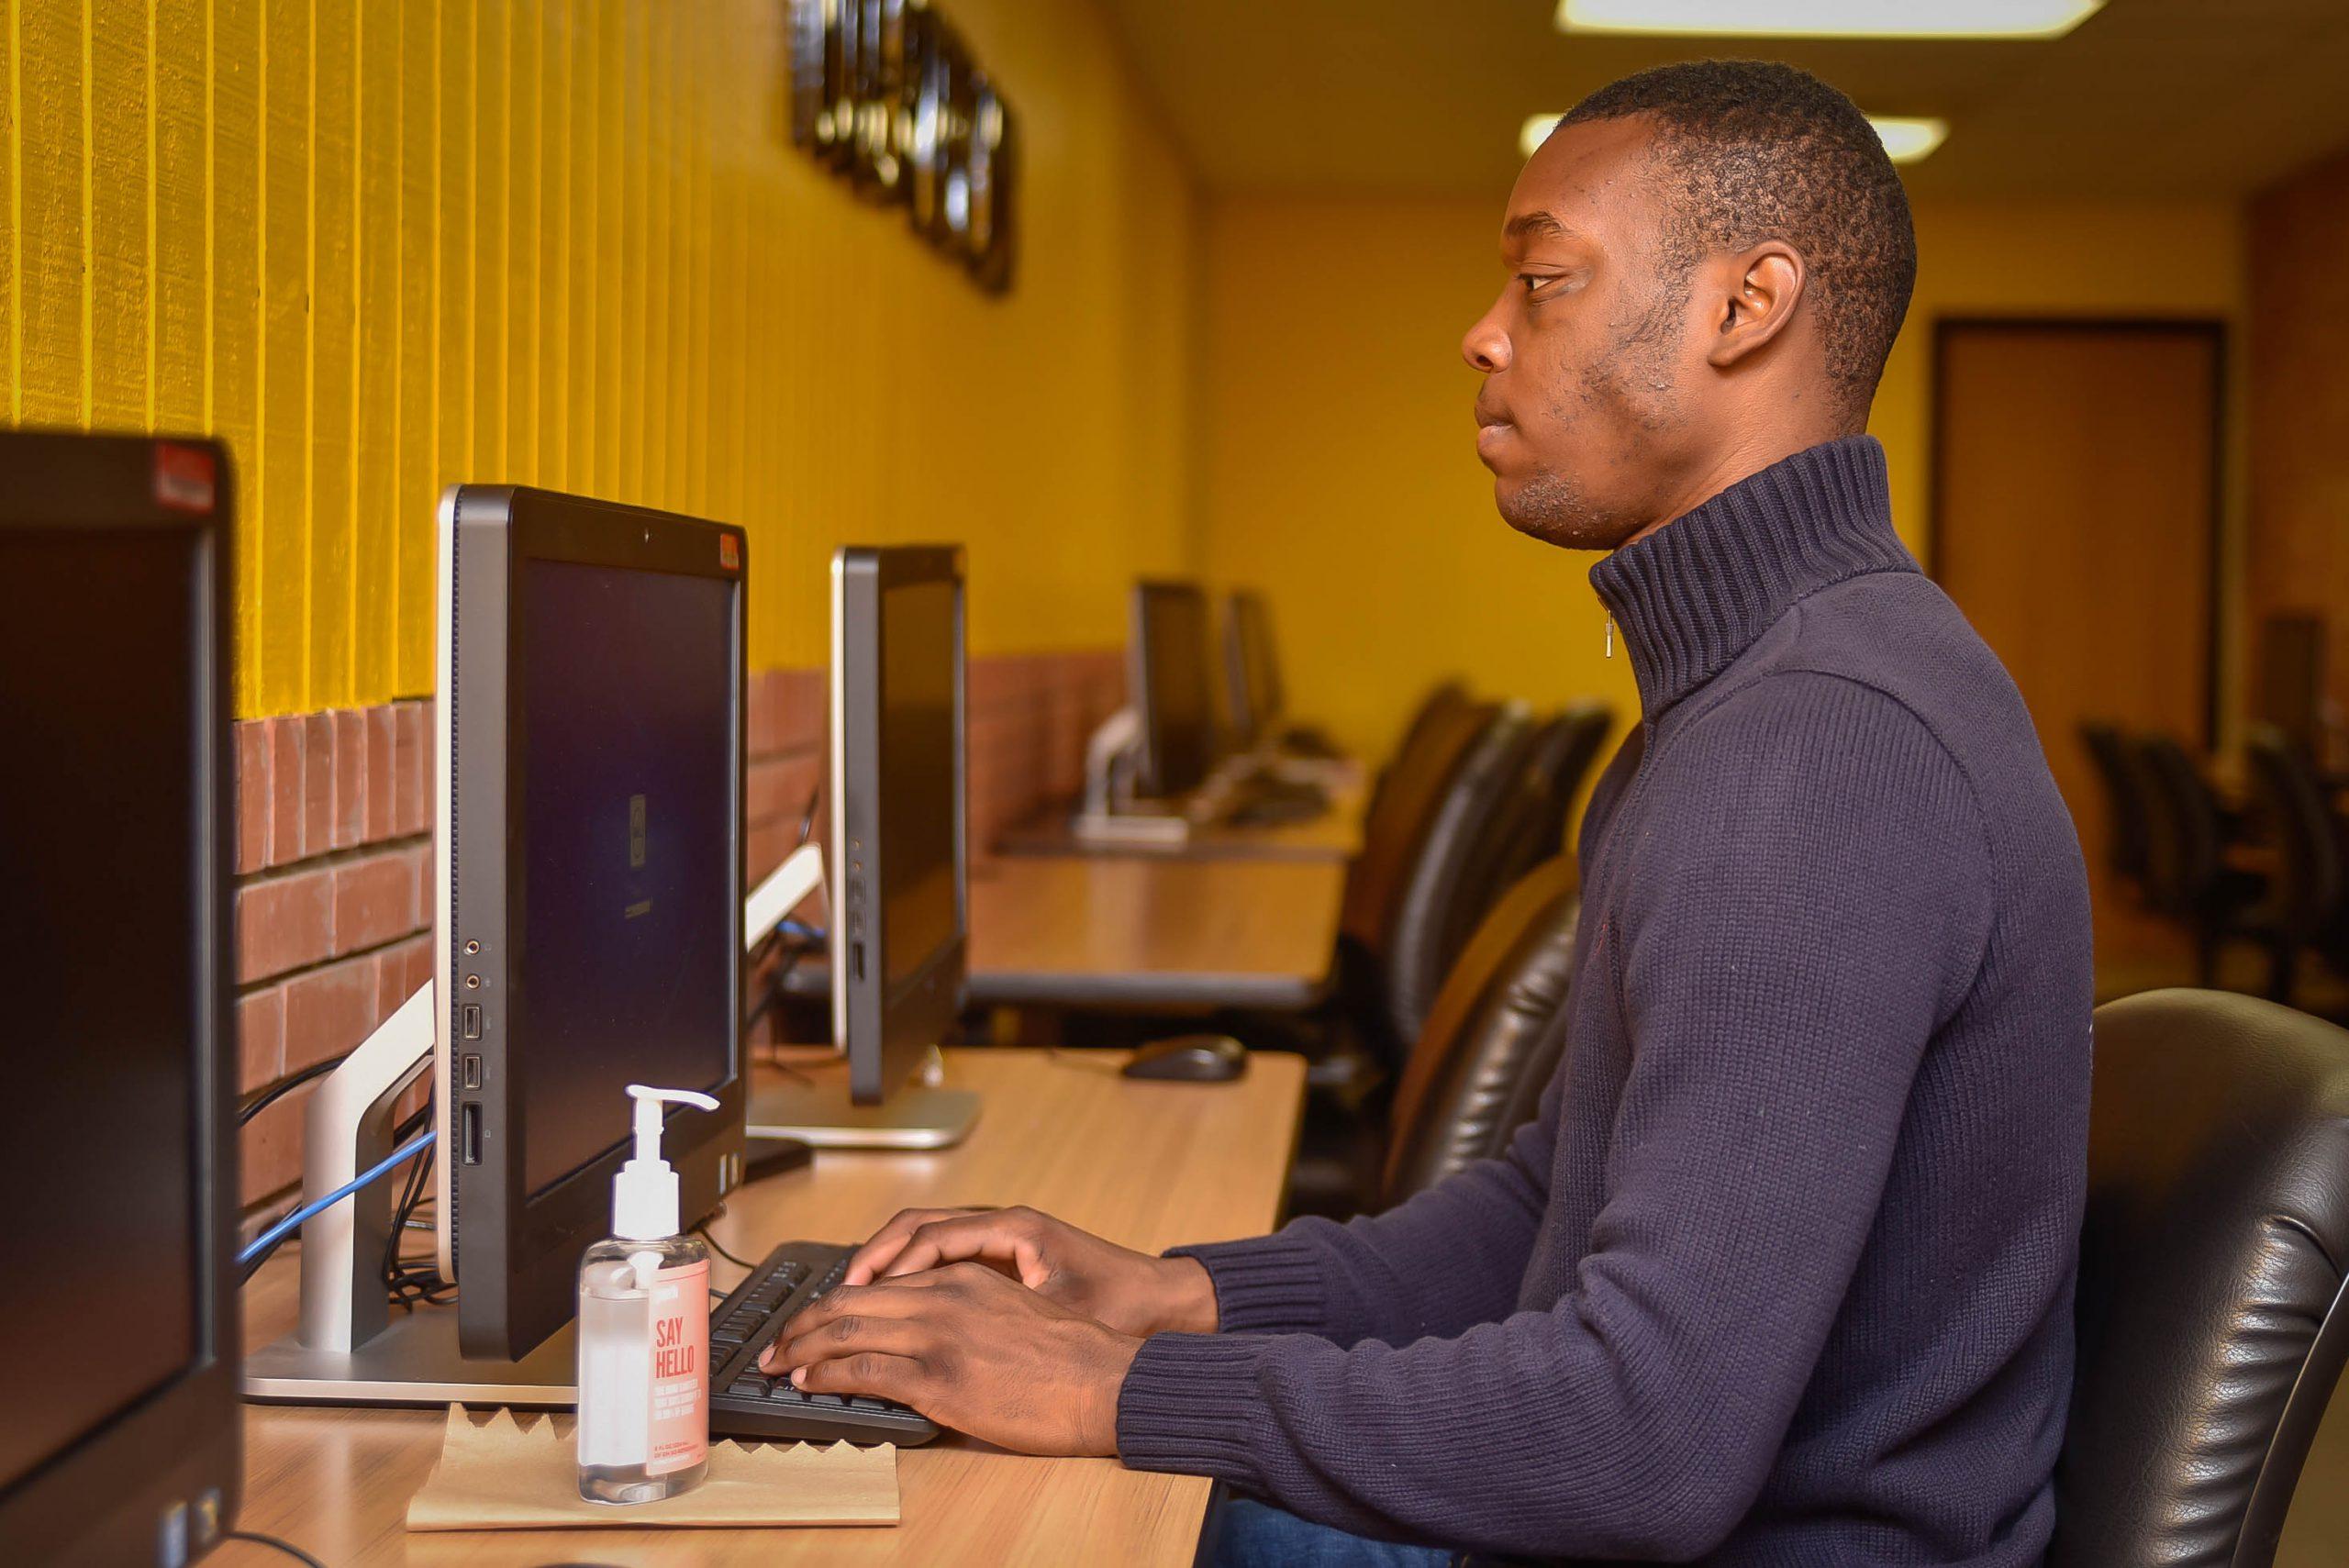 GSU Student on Lab Computer